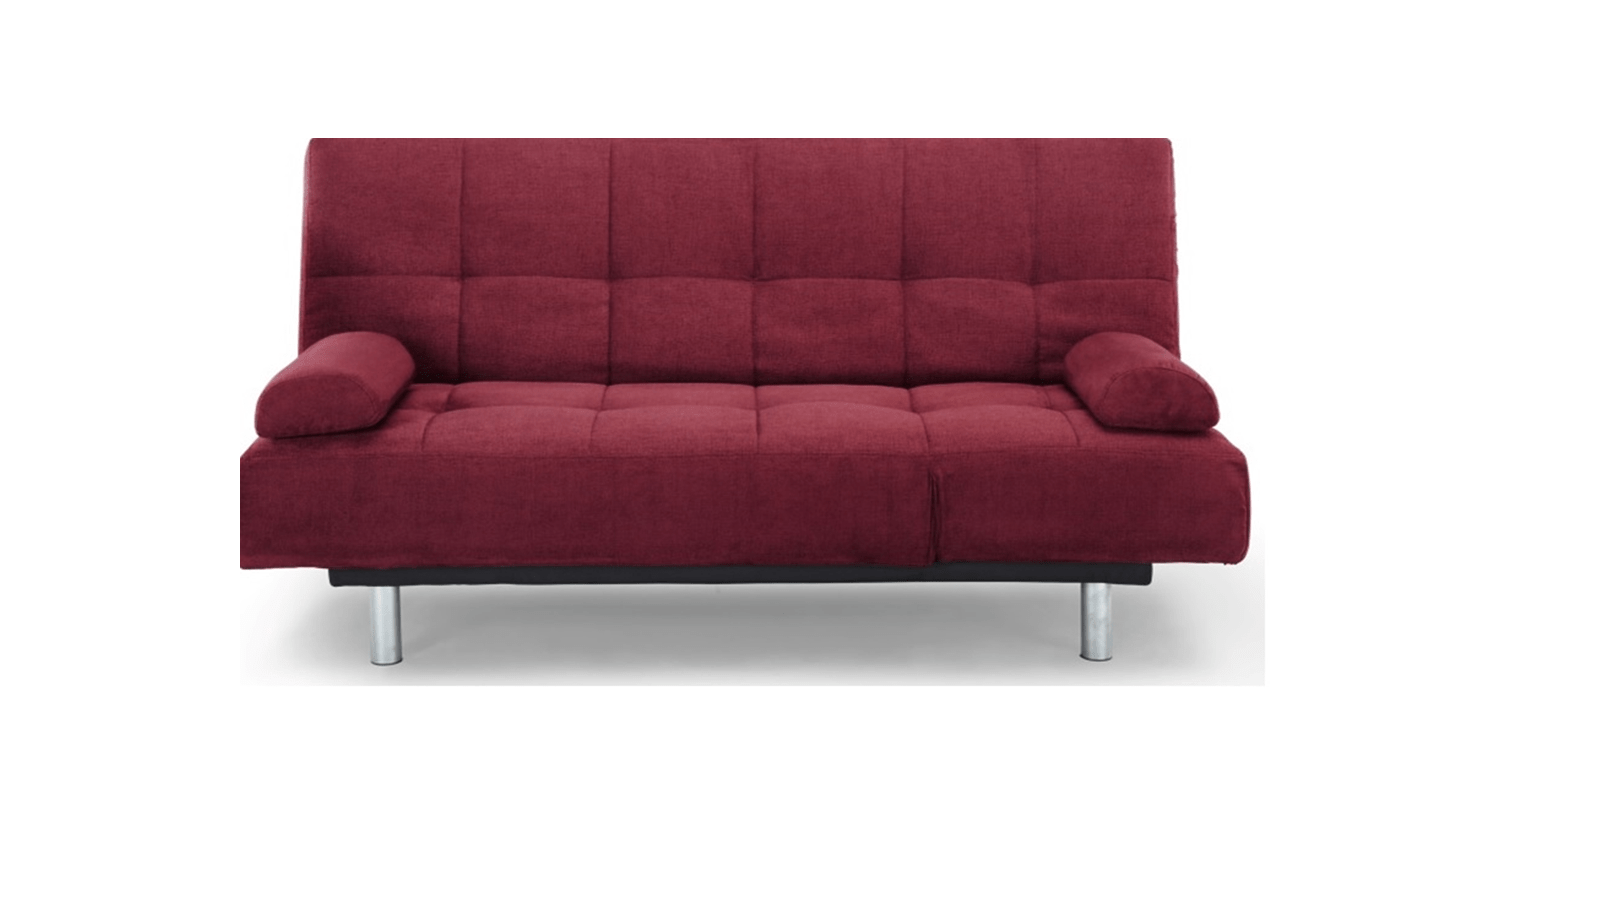 sleeper sofa comparison cama madrid milanuncios hampton washable fabric bed harvey norman malaysia